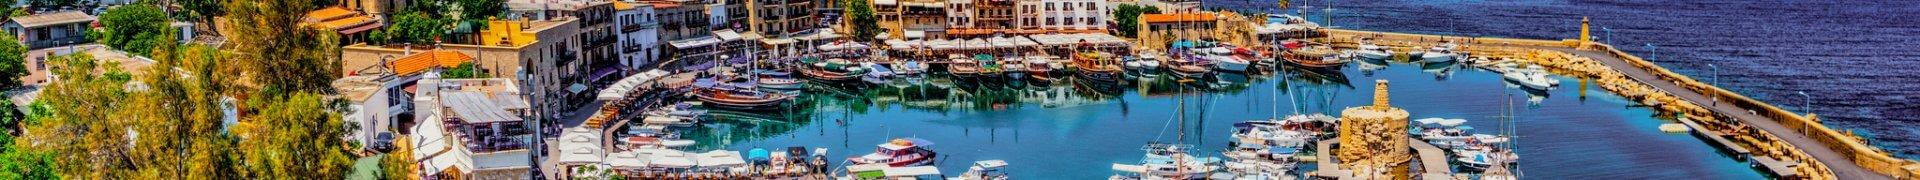 Kuzey Kıbrıs'ta Yaşama